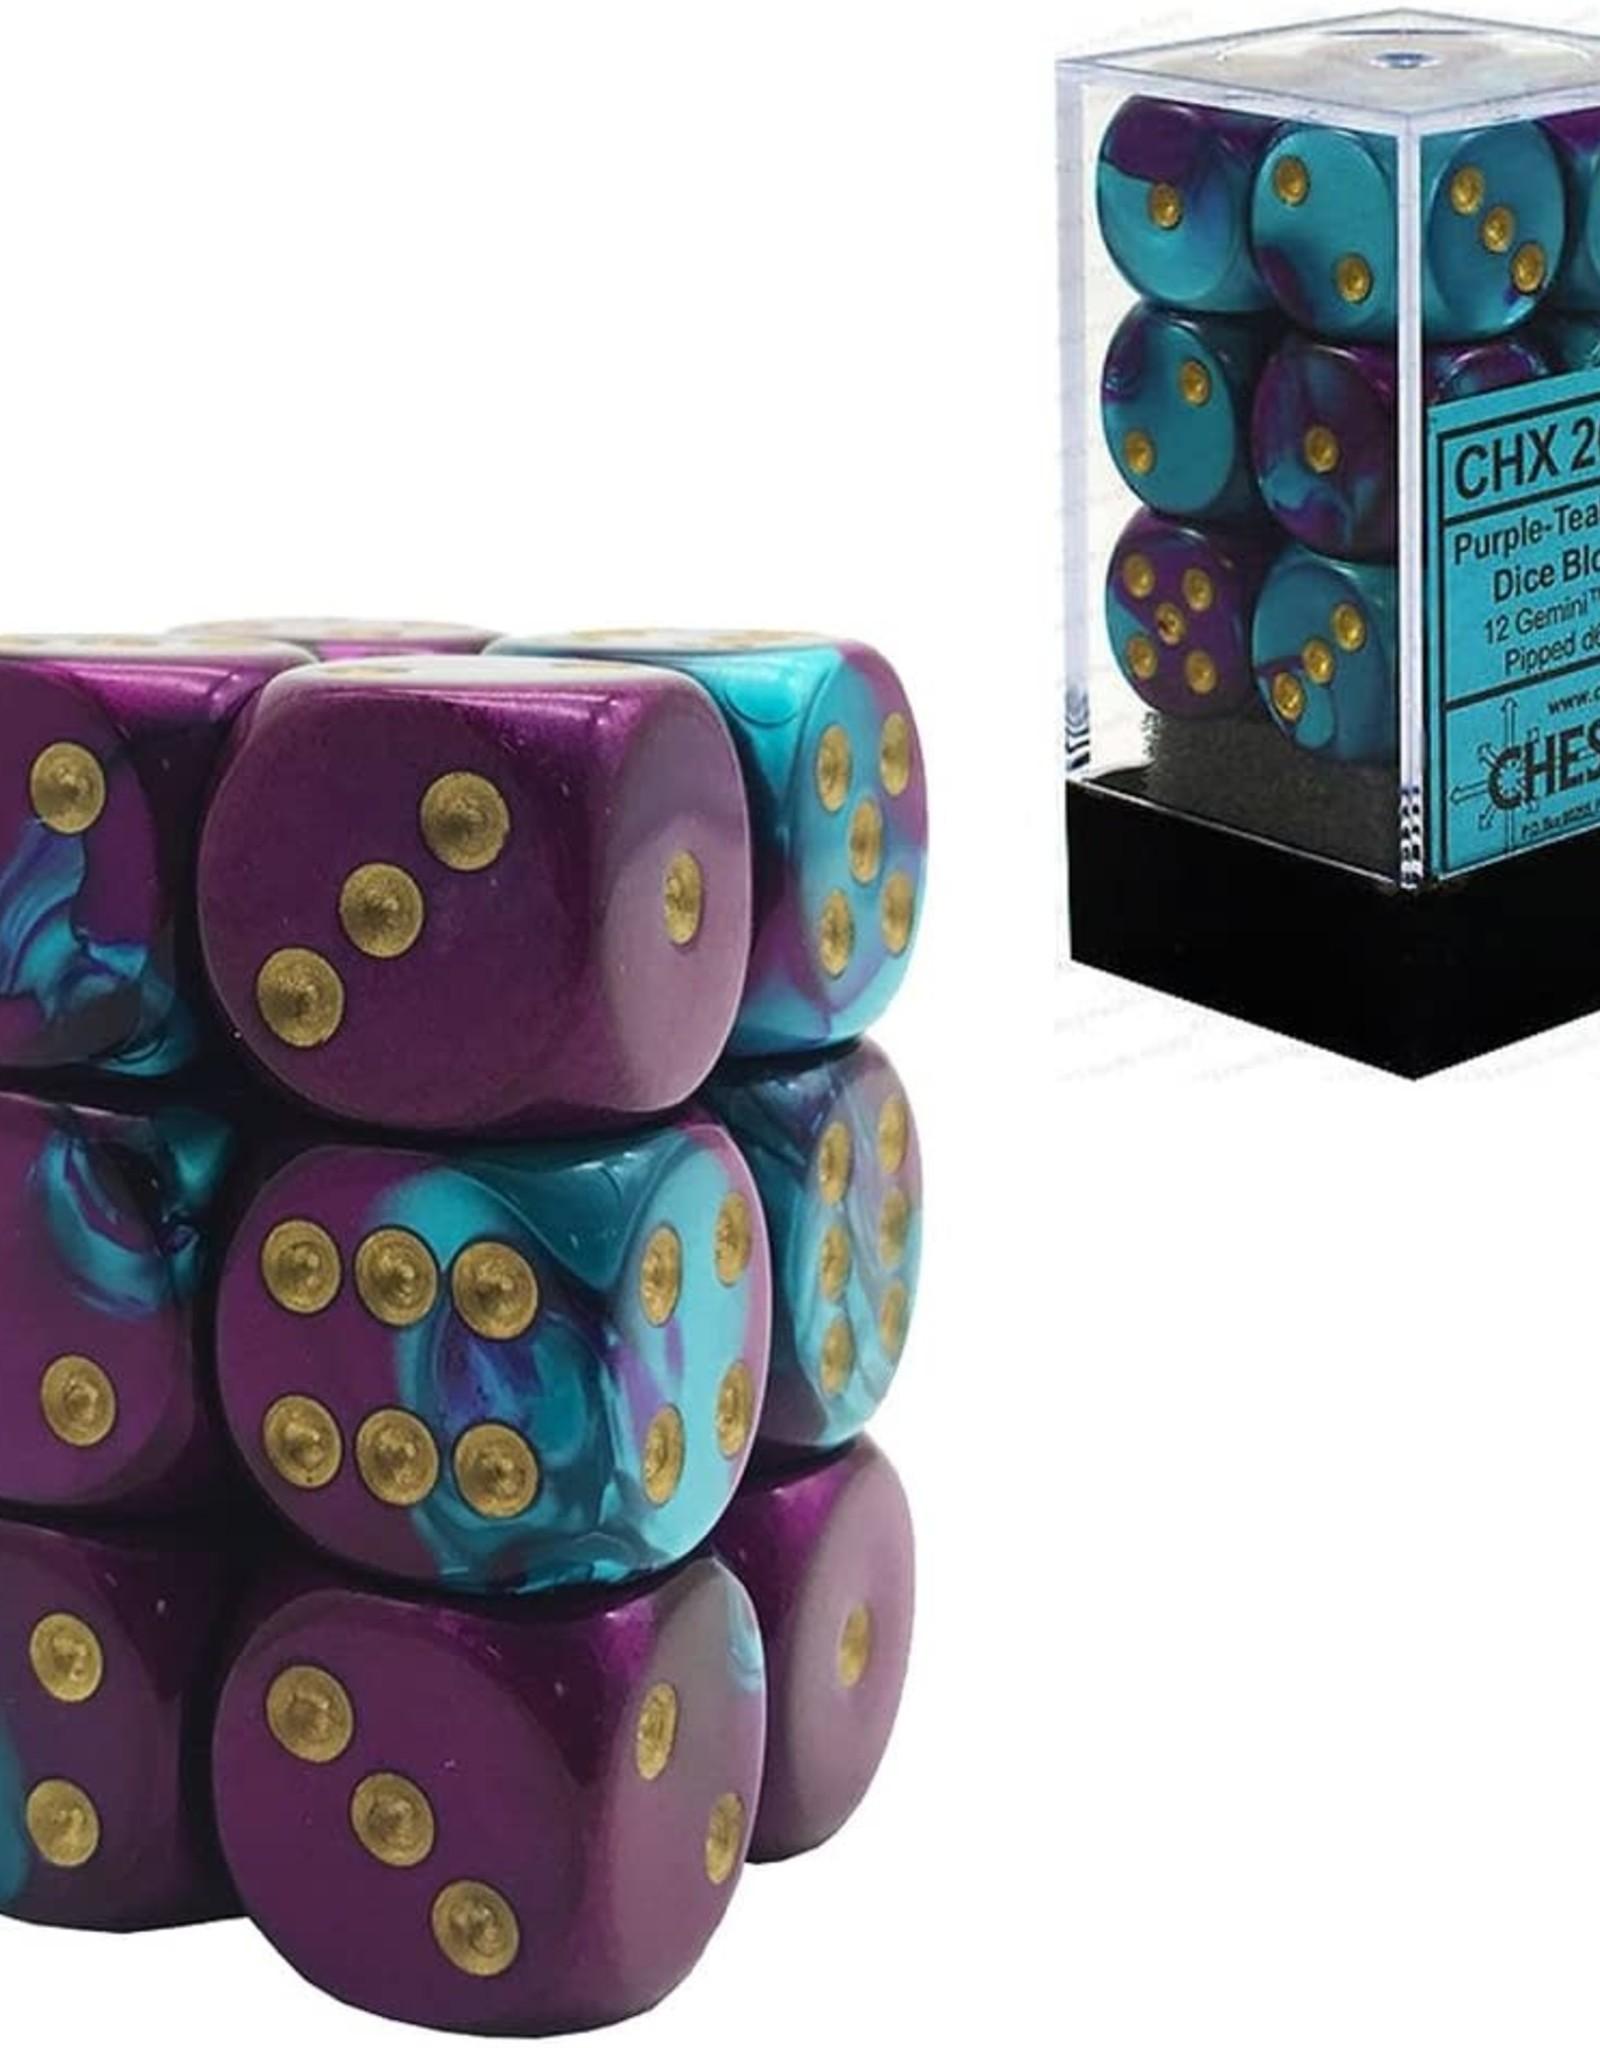 Chessex DICE GEMINI 12D6 PURPLE-TEAL/GOLD 16MM